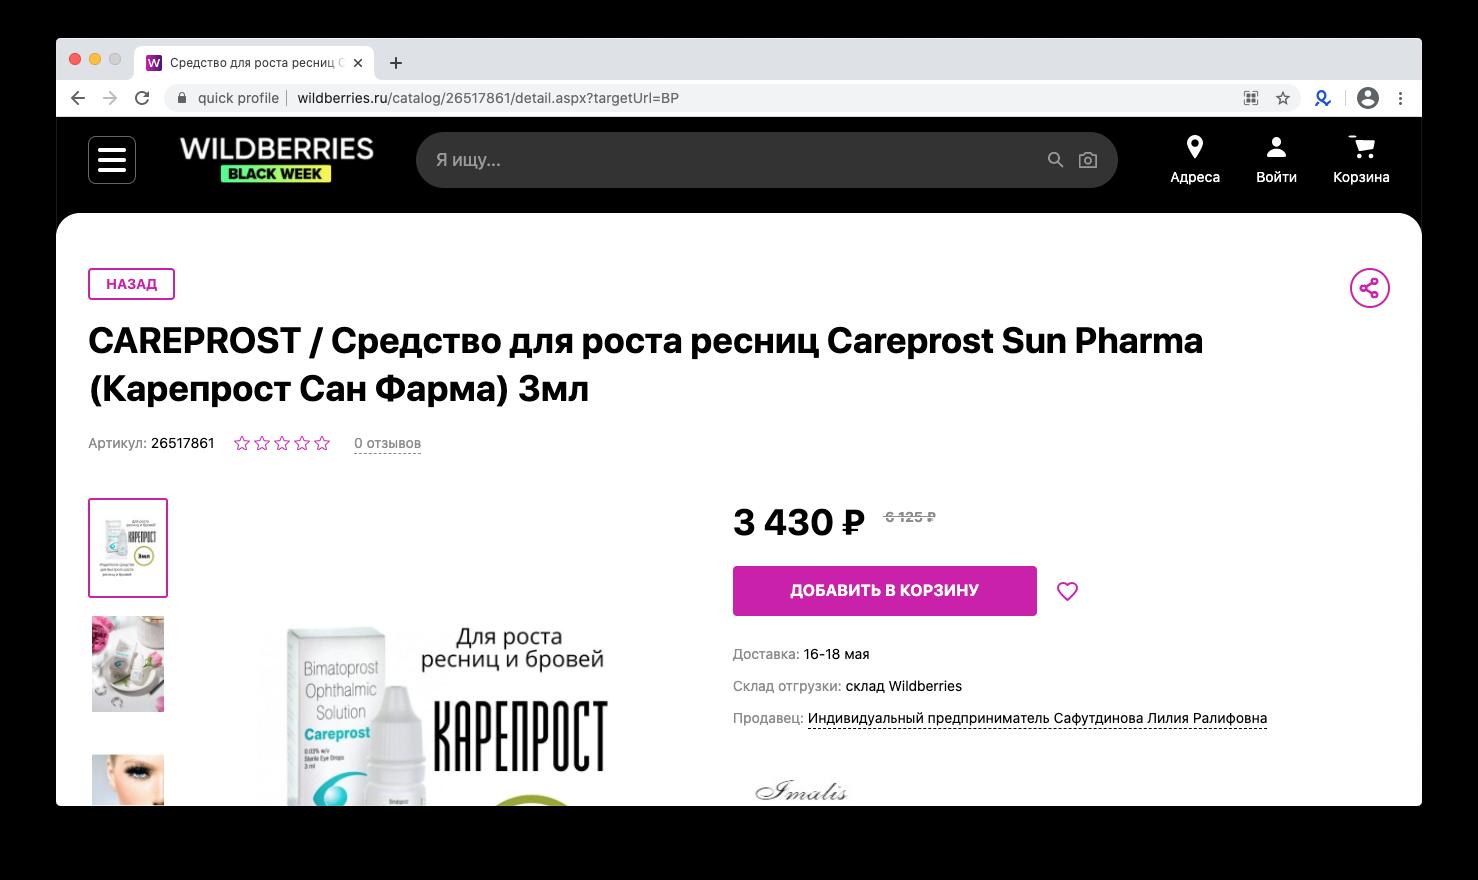 careprost3430rub2.png